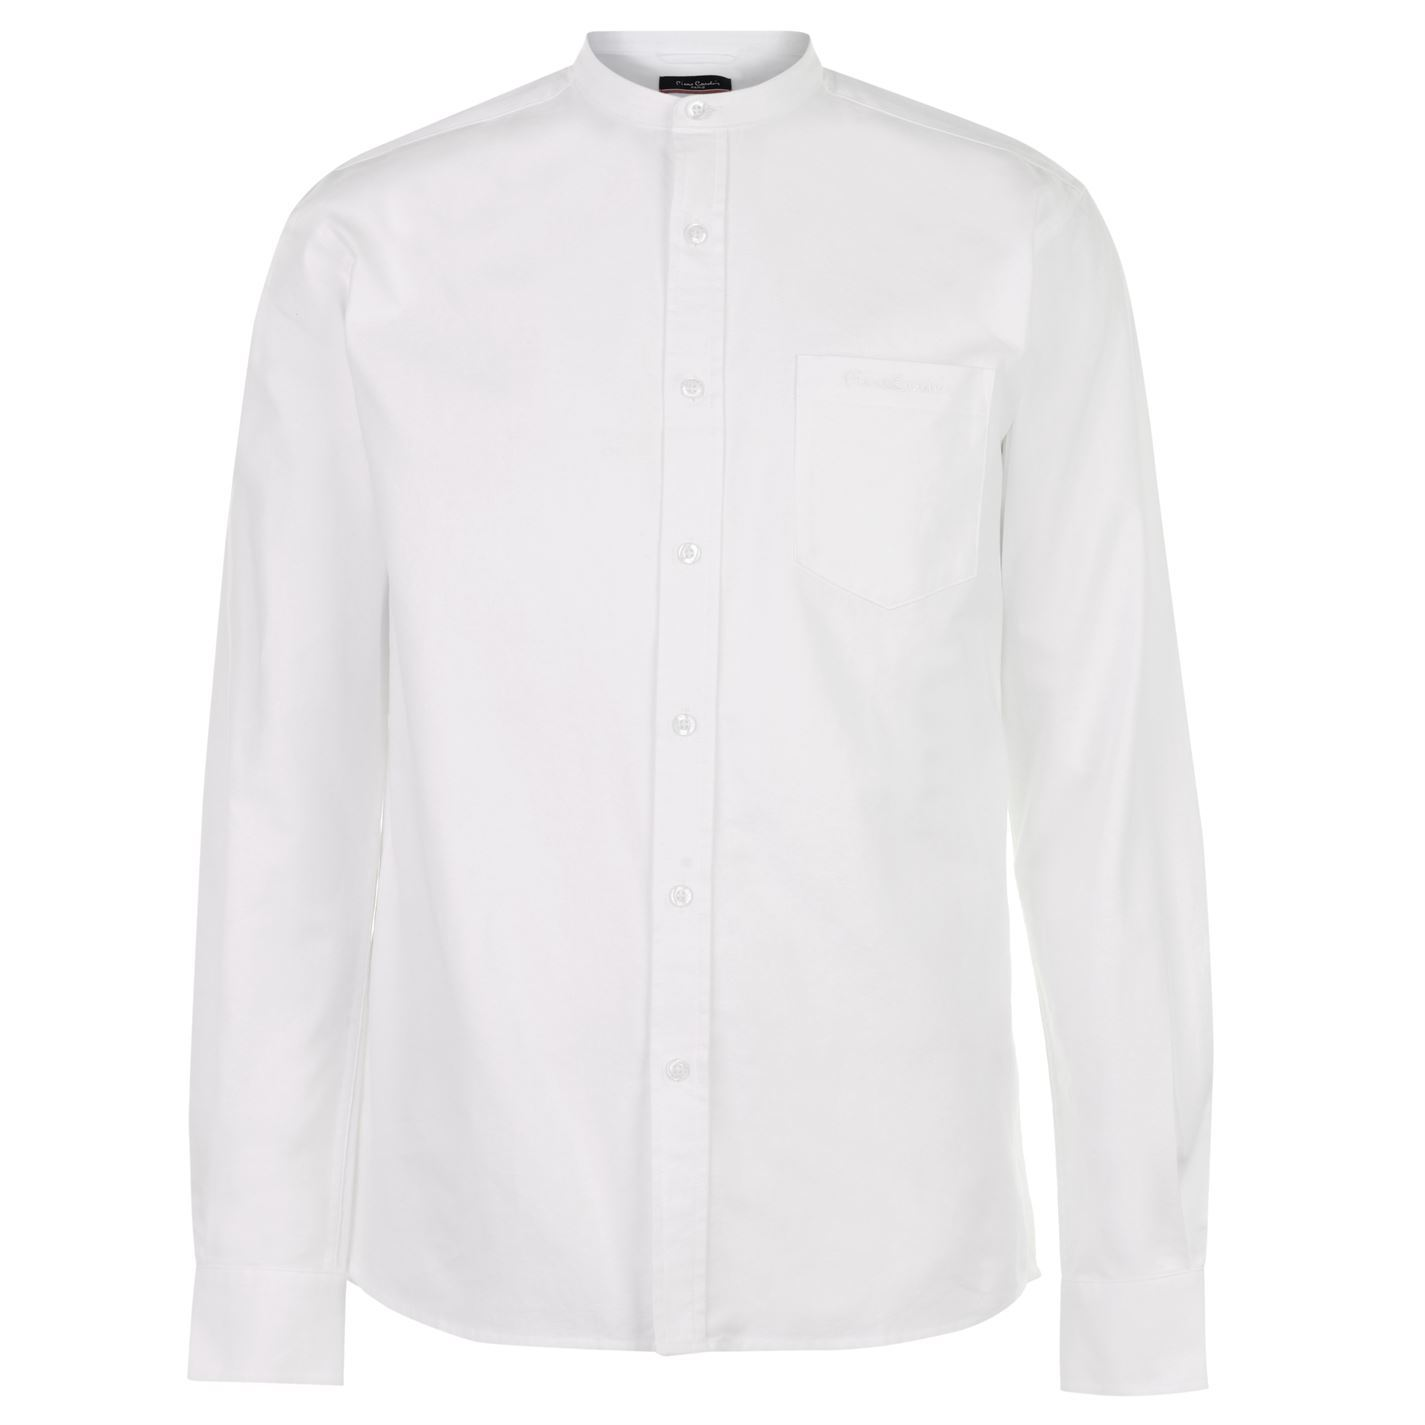 Pierre-Cardin-Mens-Grandad-Collar-Oxford-Shirt-Long-Sleeve-Casual-Cotton-Button